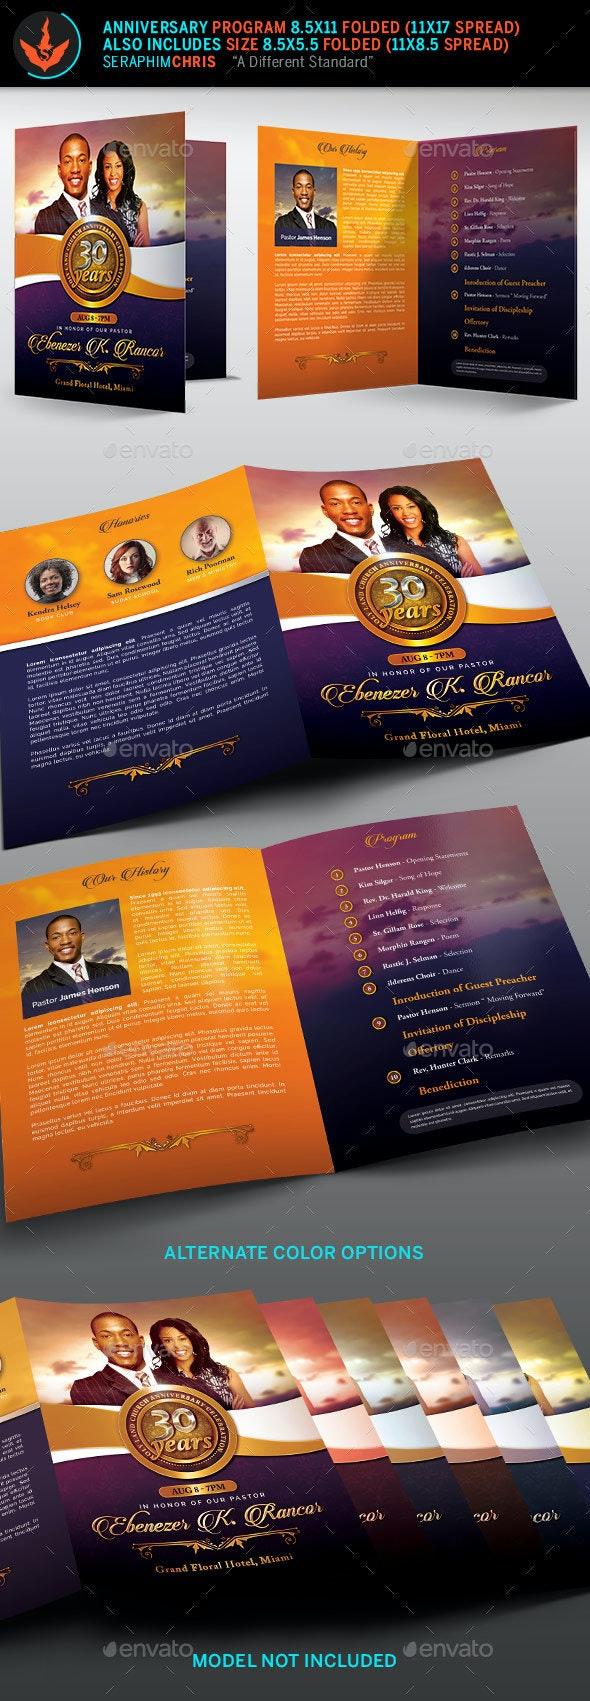 Church Anniversary Program Template - Informational Brochures